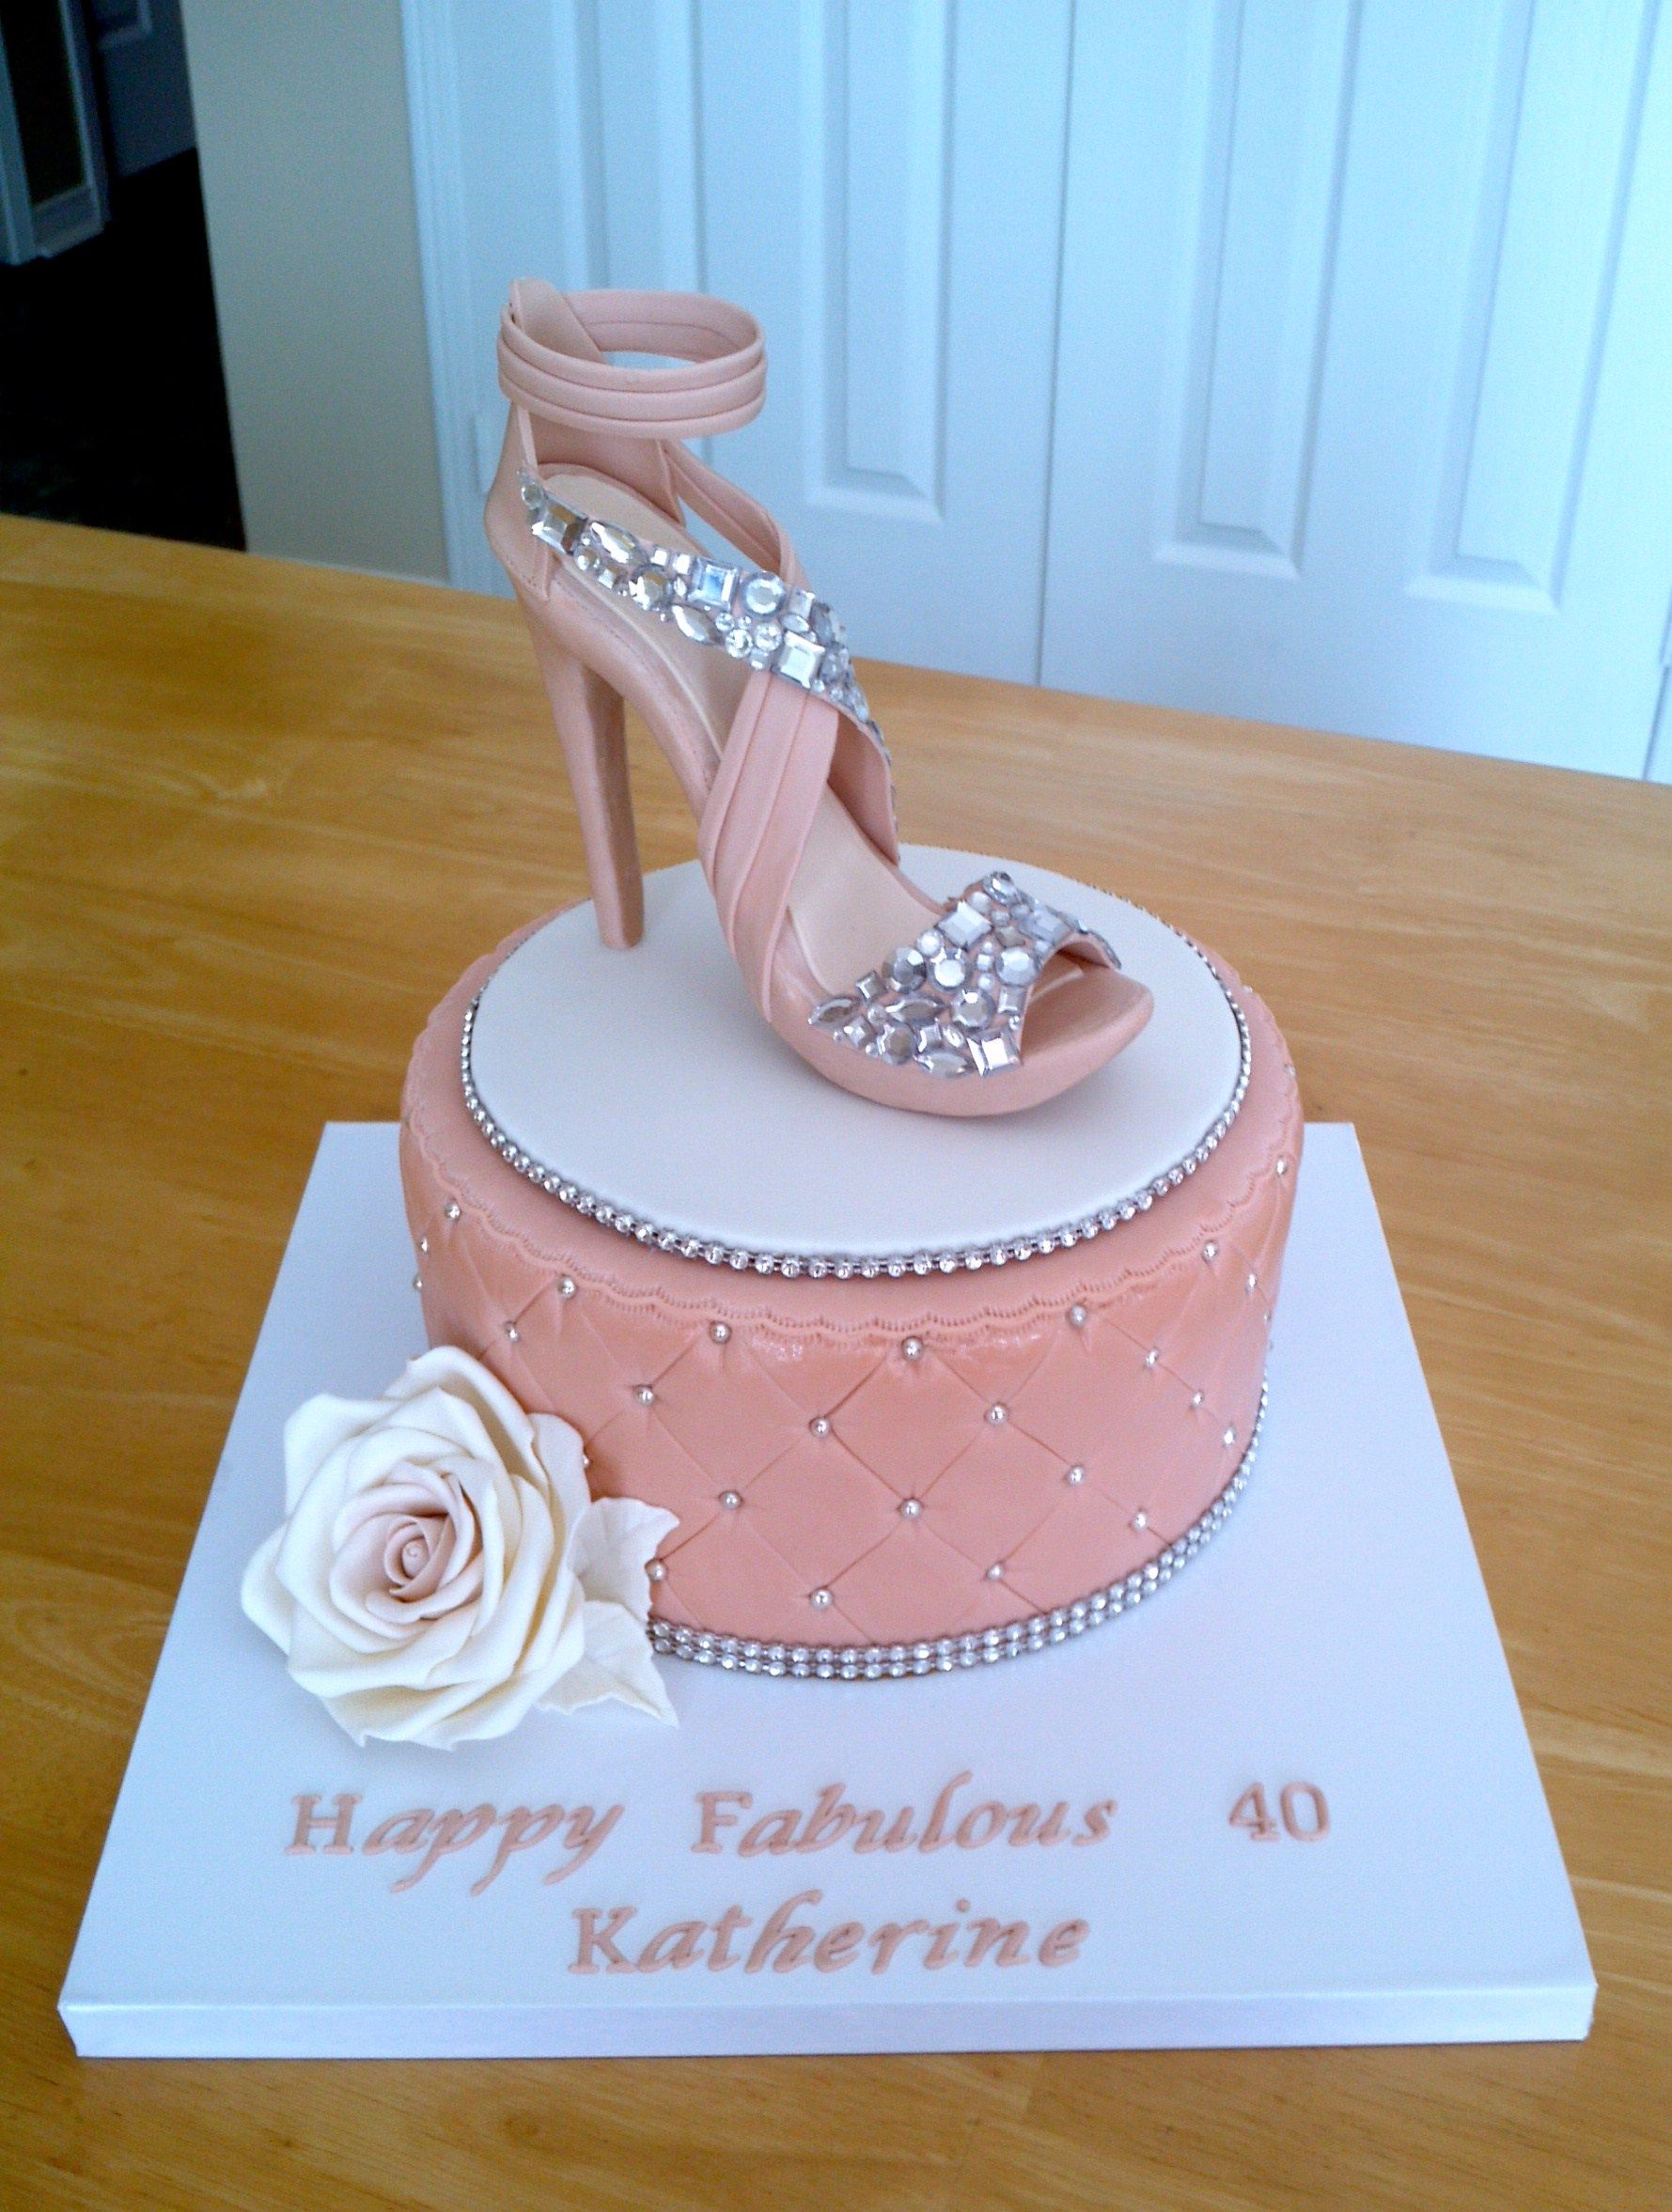 Fabulous 40 Cakes 40th Birthday Cakes Birthday Cake